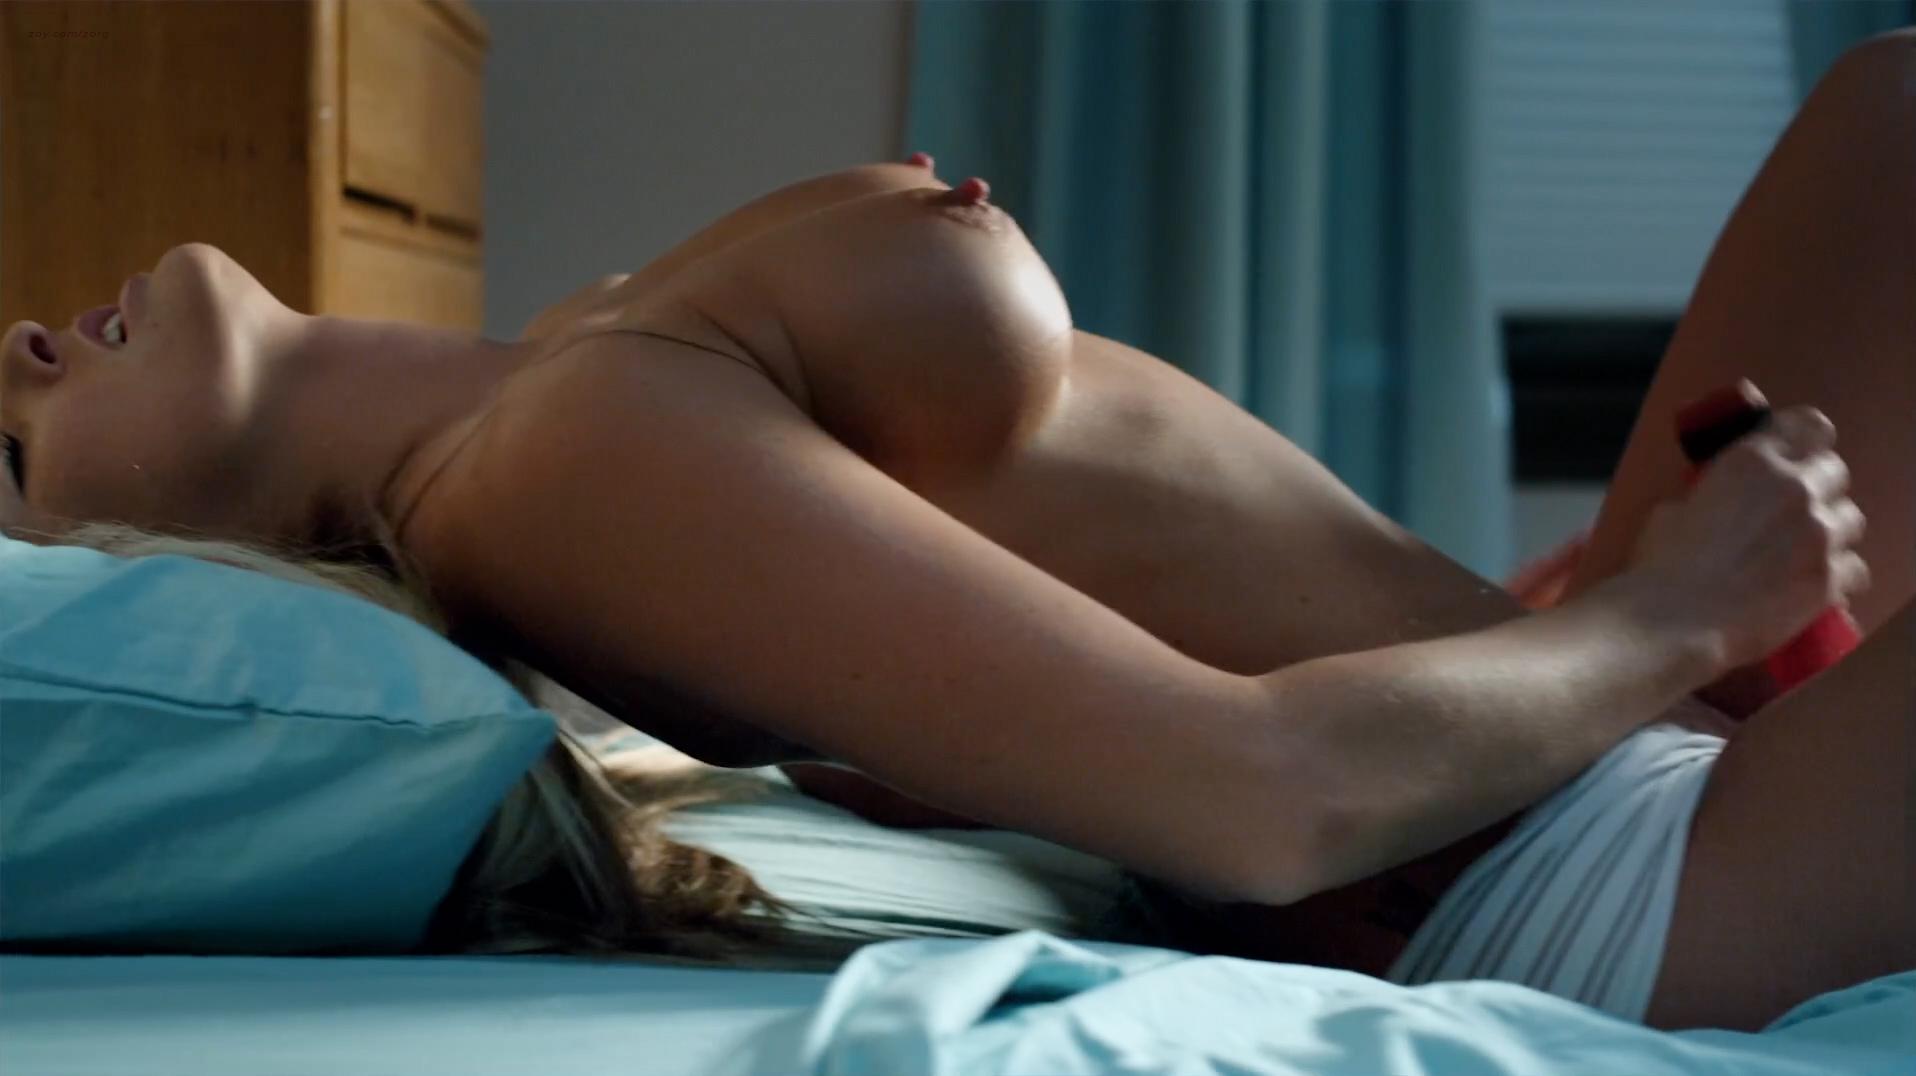 kristin-cavallari-nude-tits-free-porn-video-agories